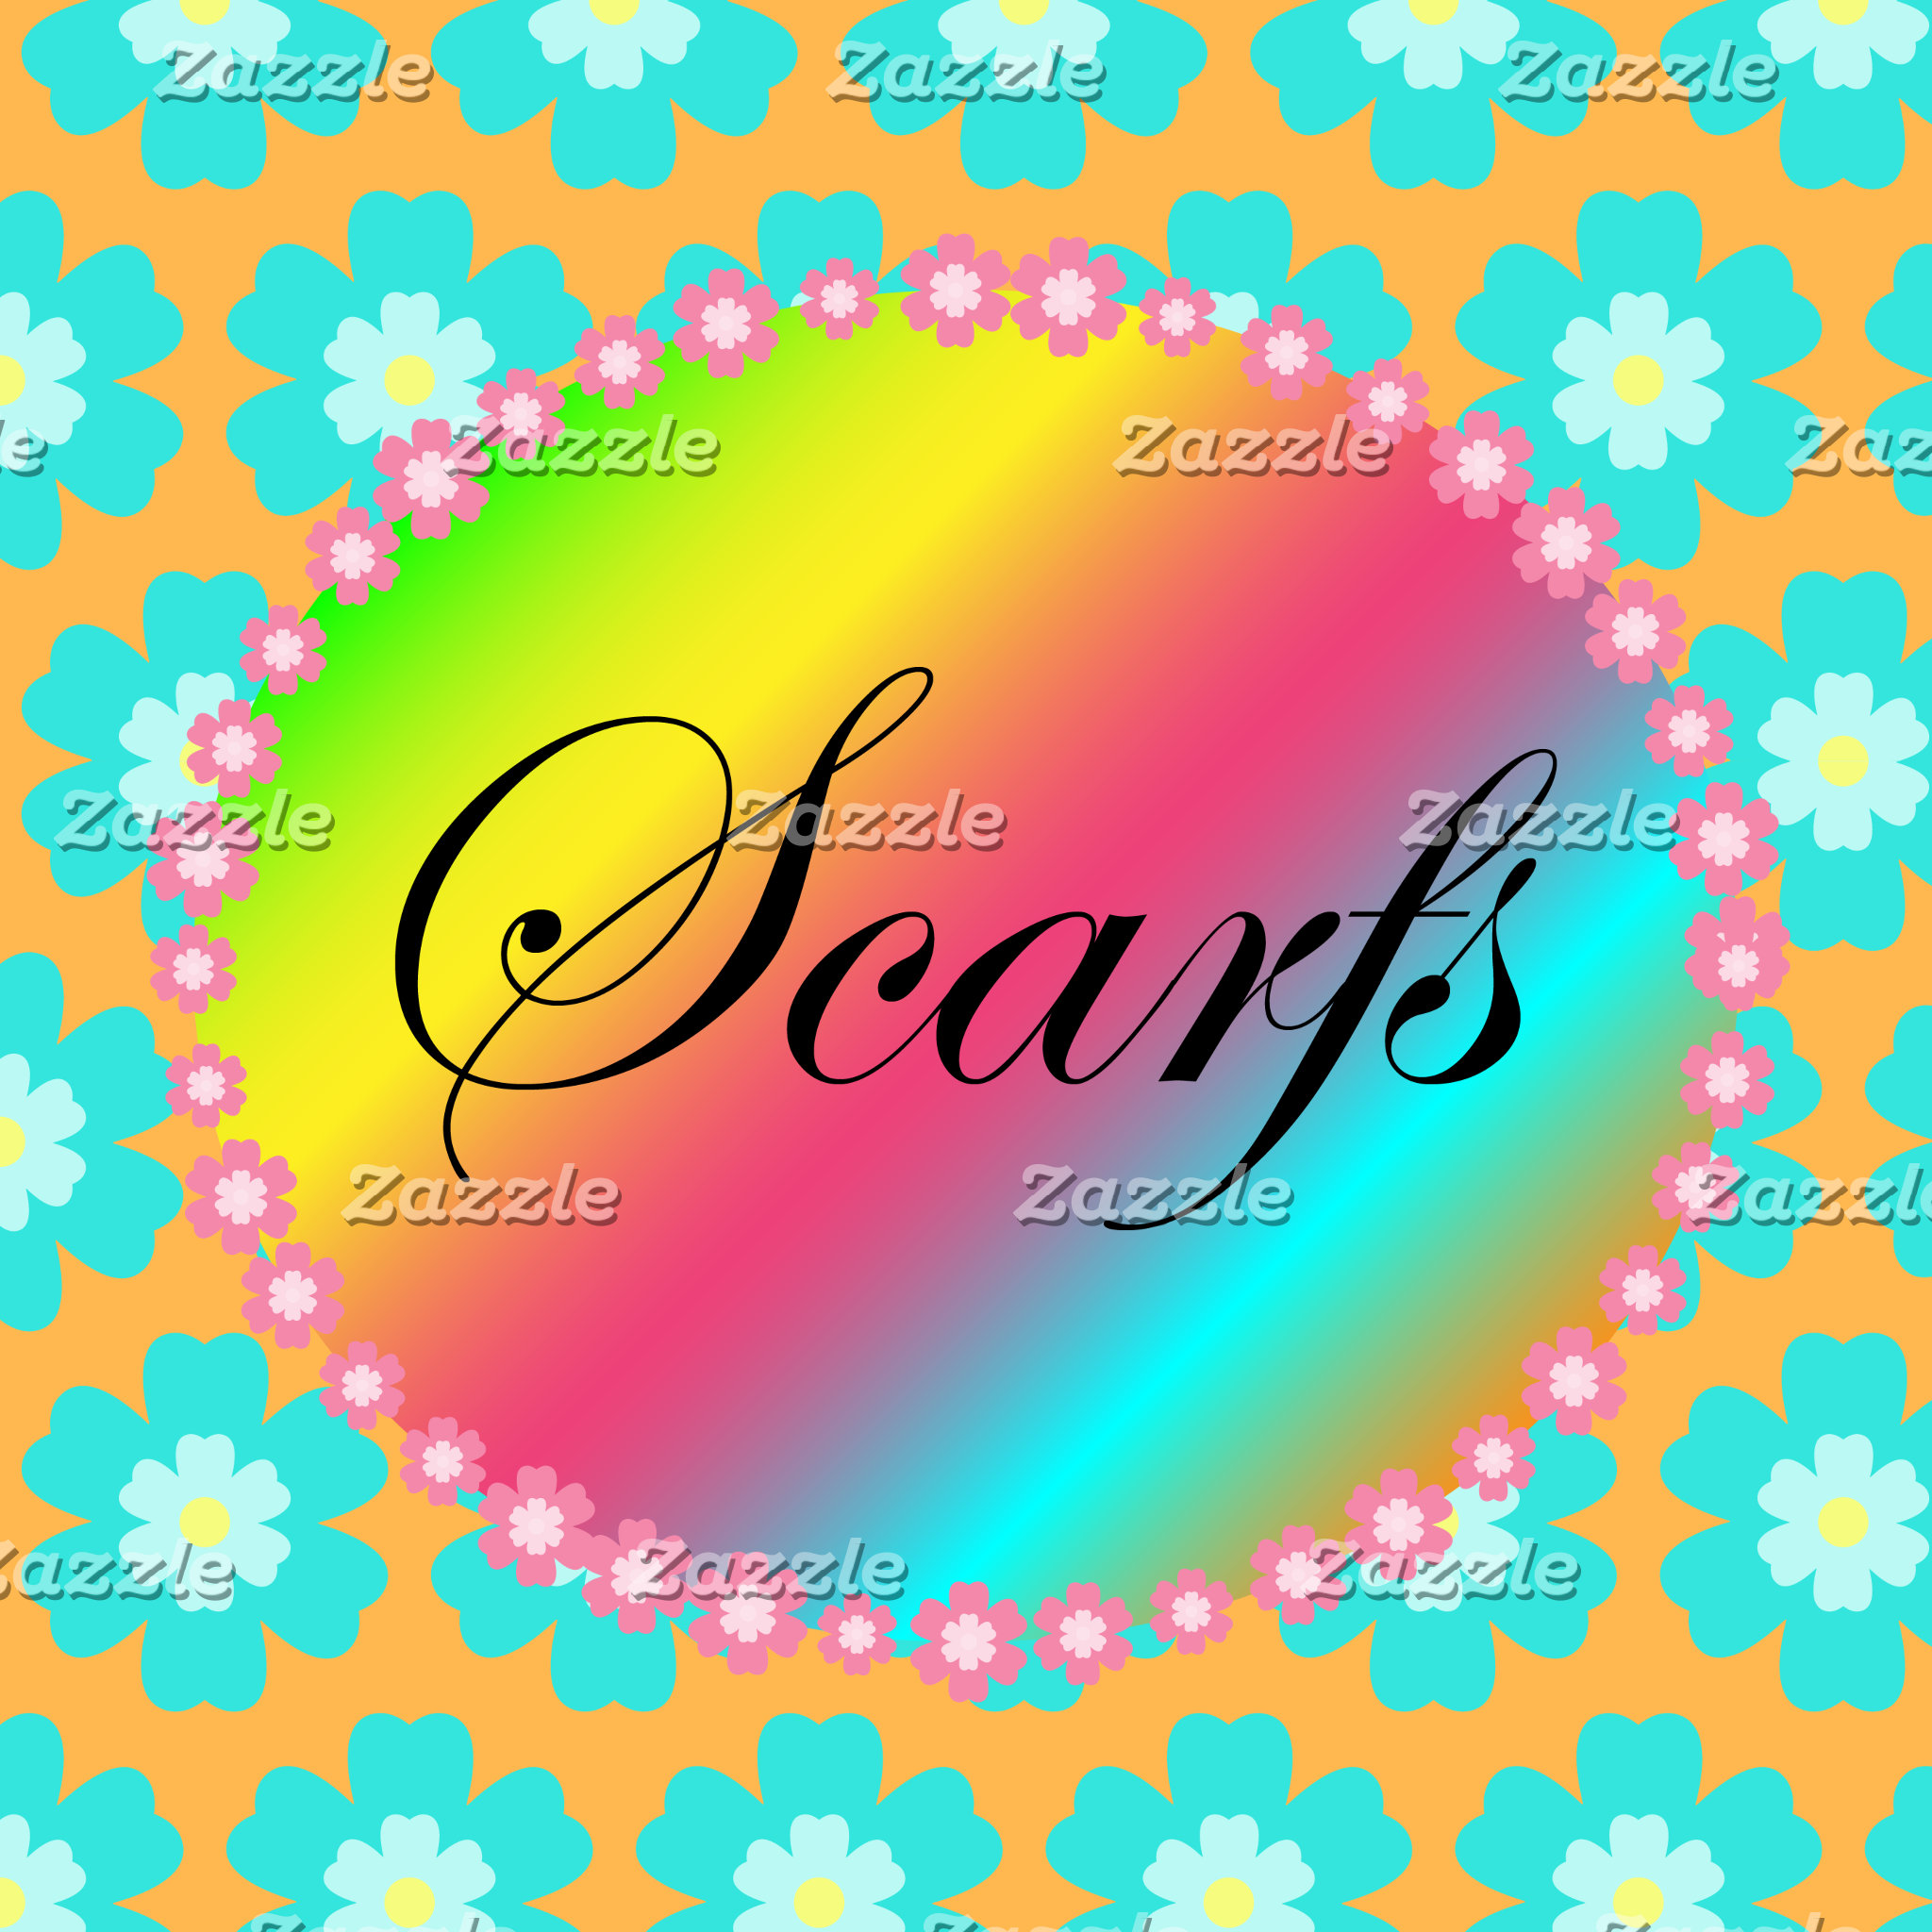 17. Scarfs